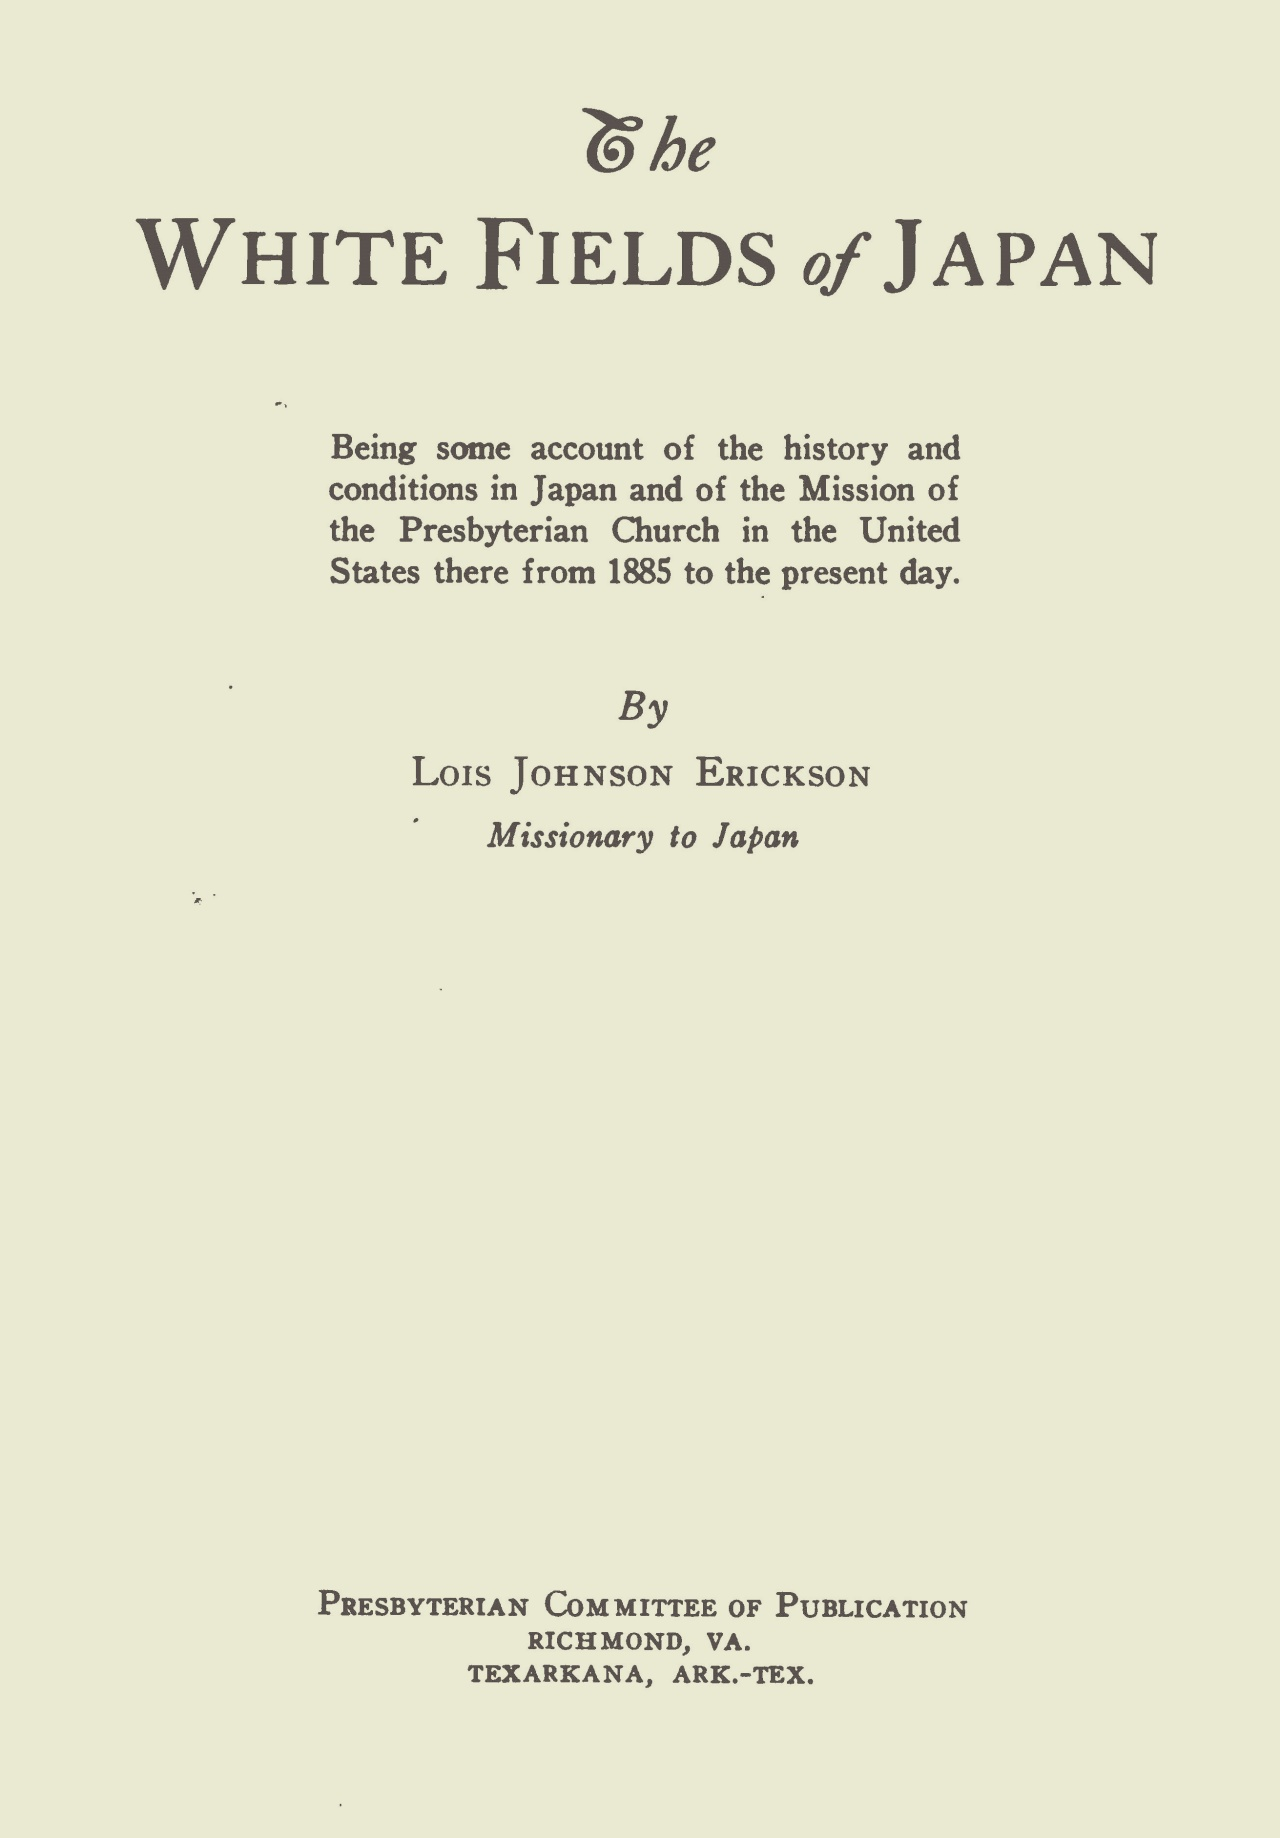 Erickson, Lois Johnson, The White Fields of Japan Title Page.jpg